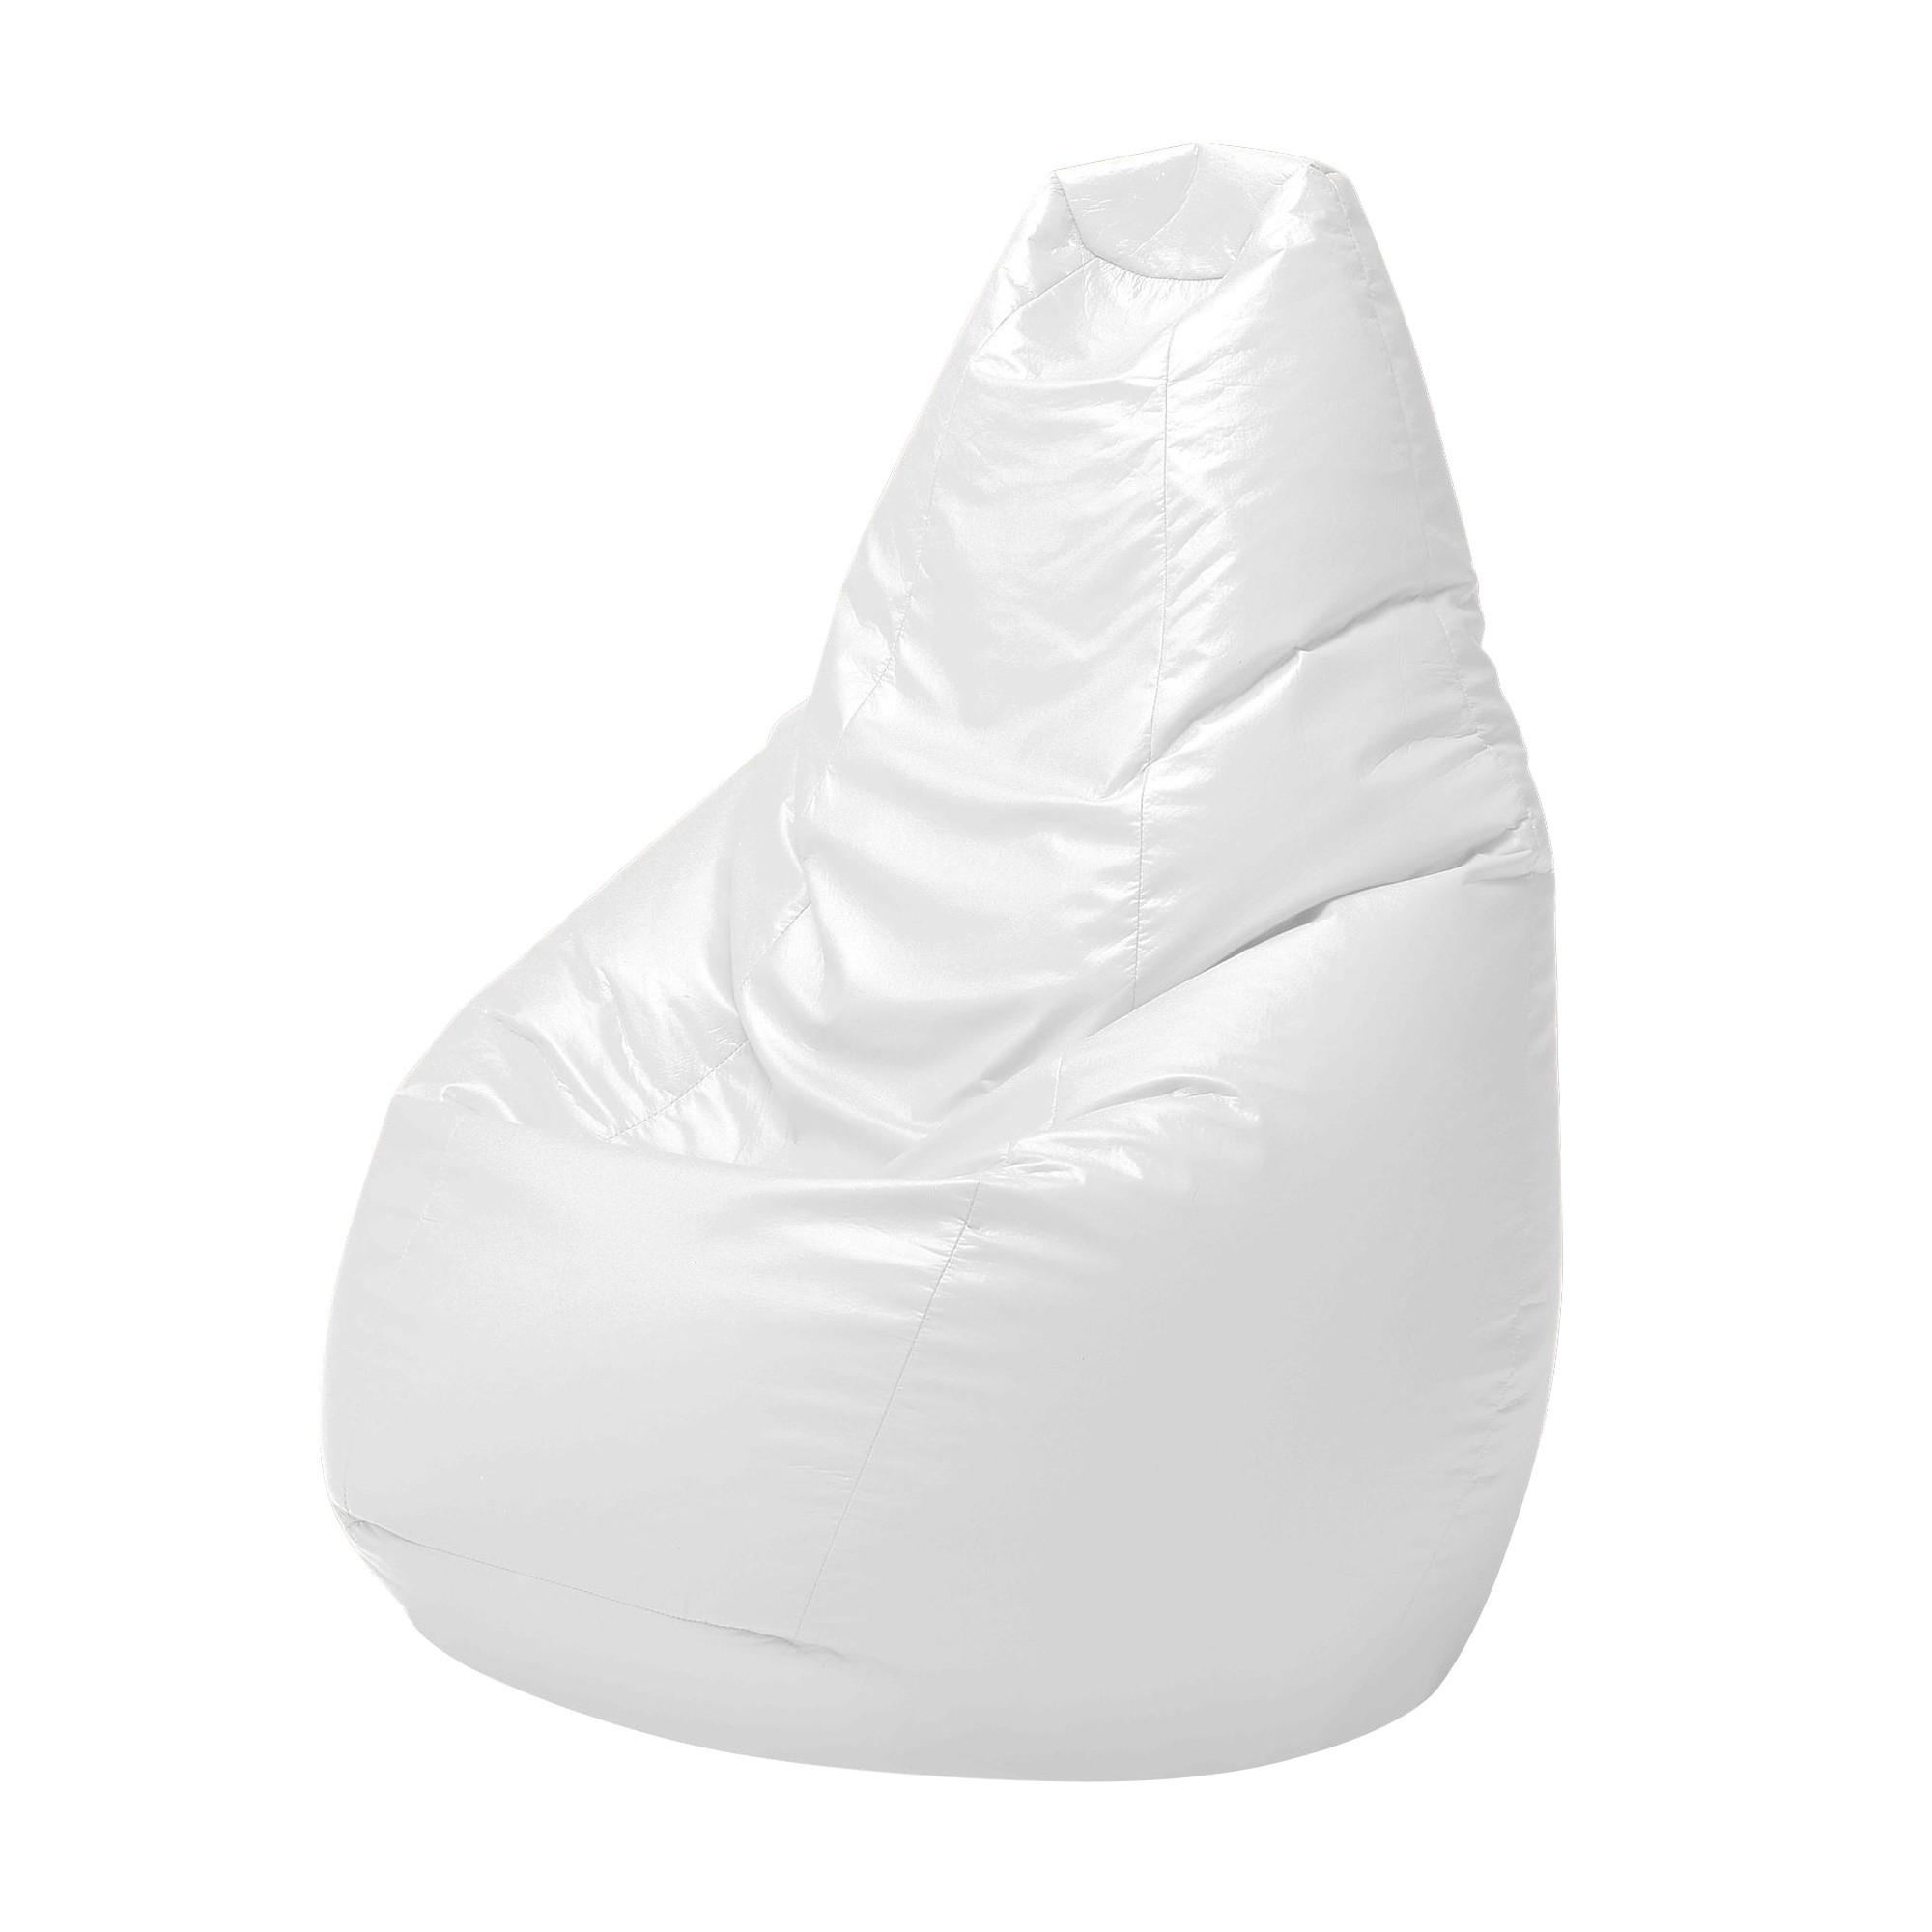 Zanotta Sacco Bean Bag Leather Ambientedirect